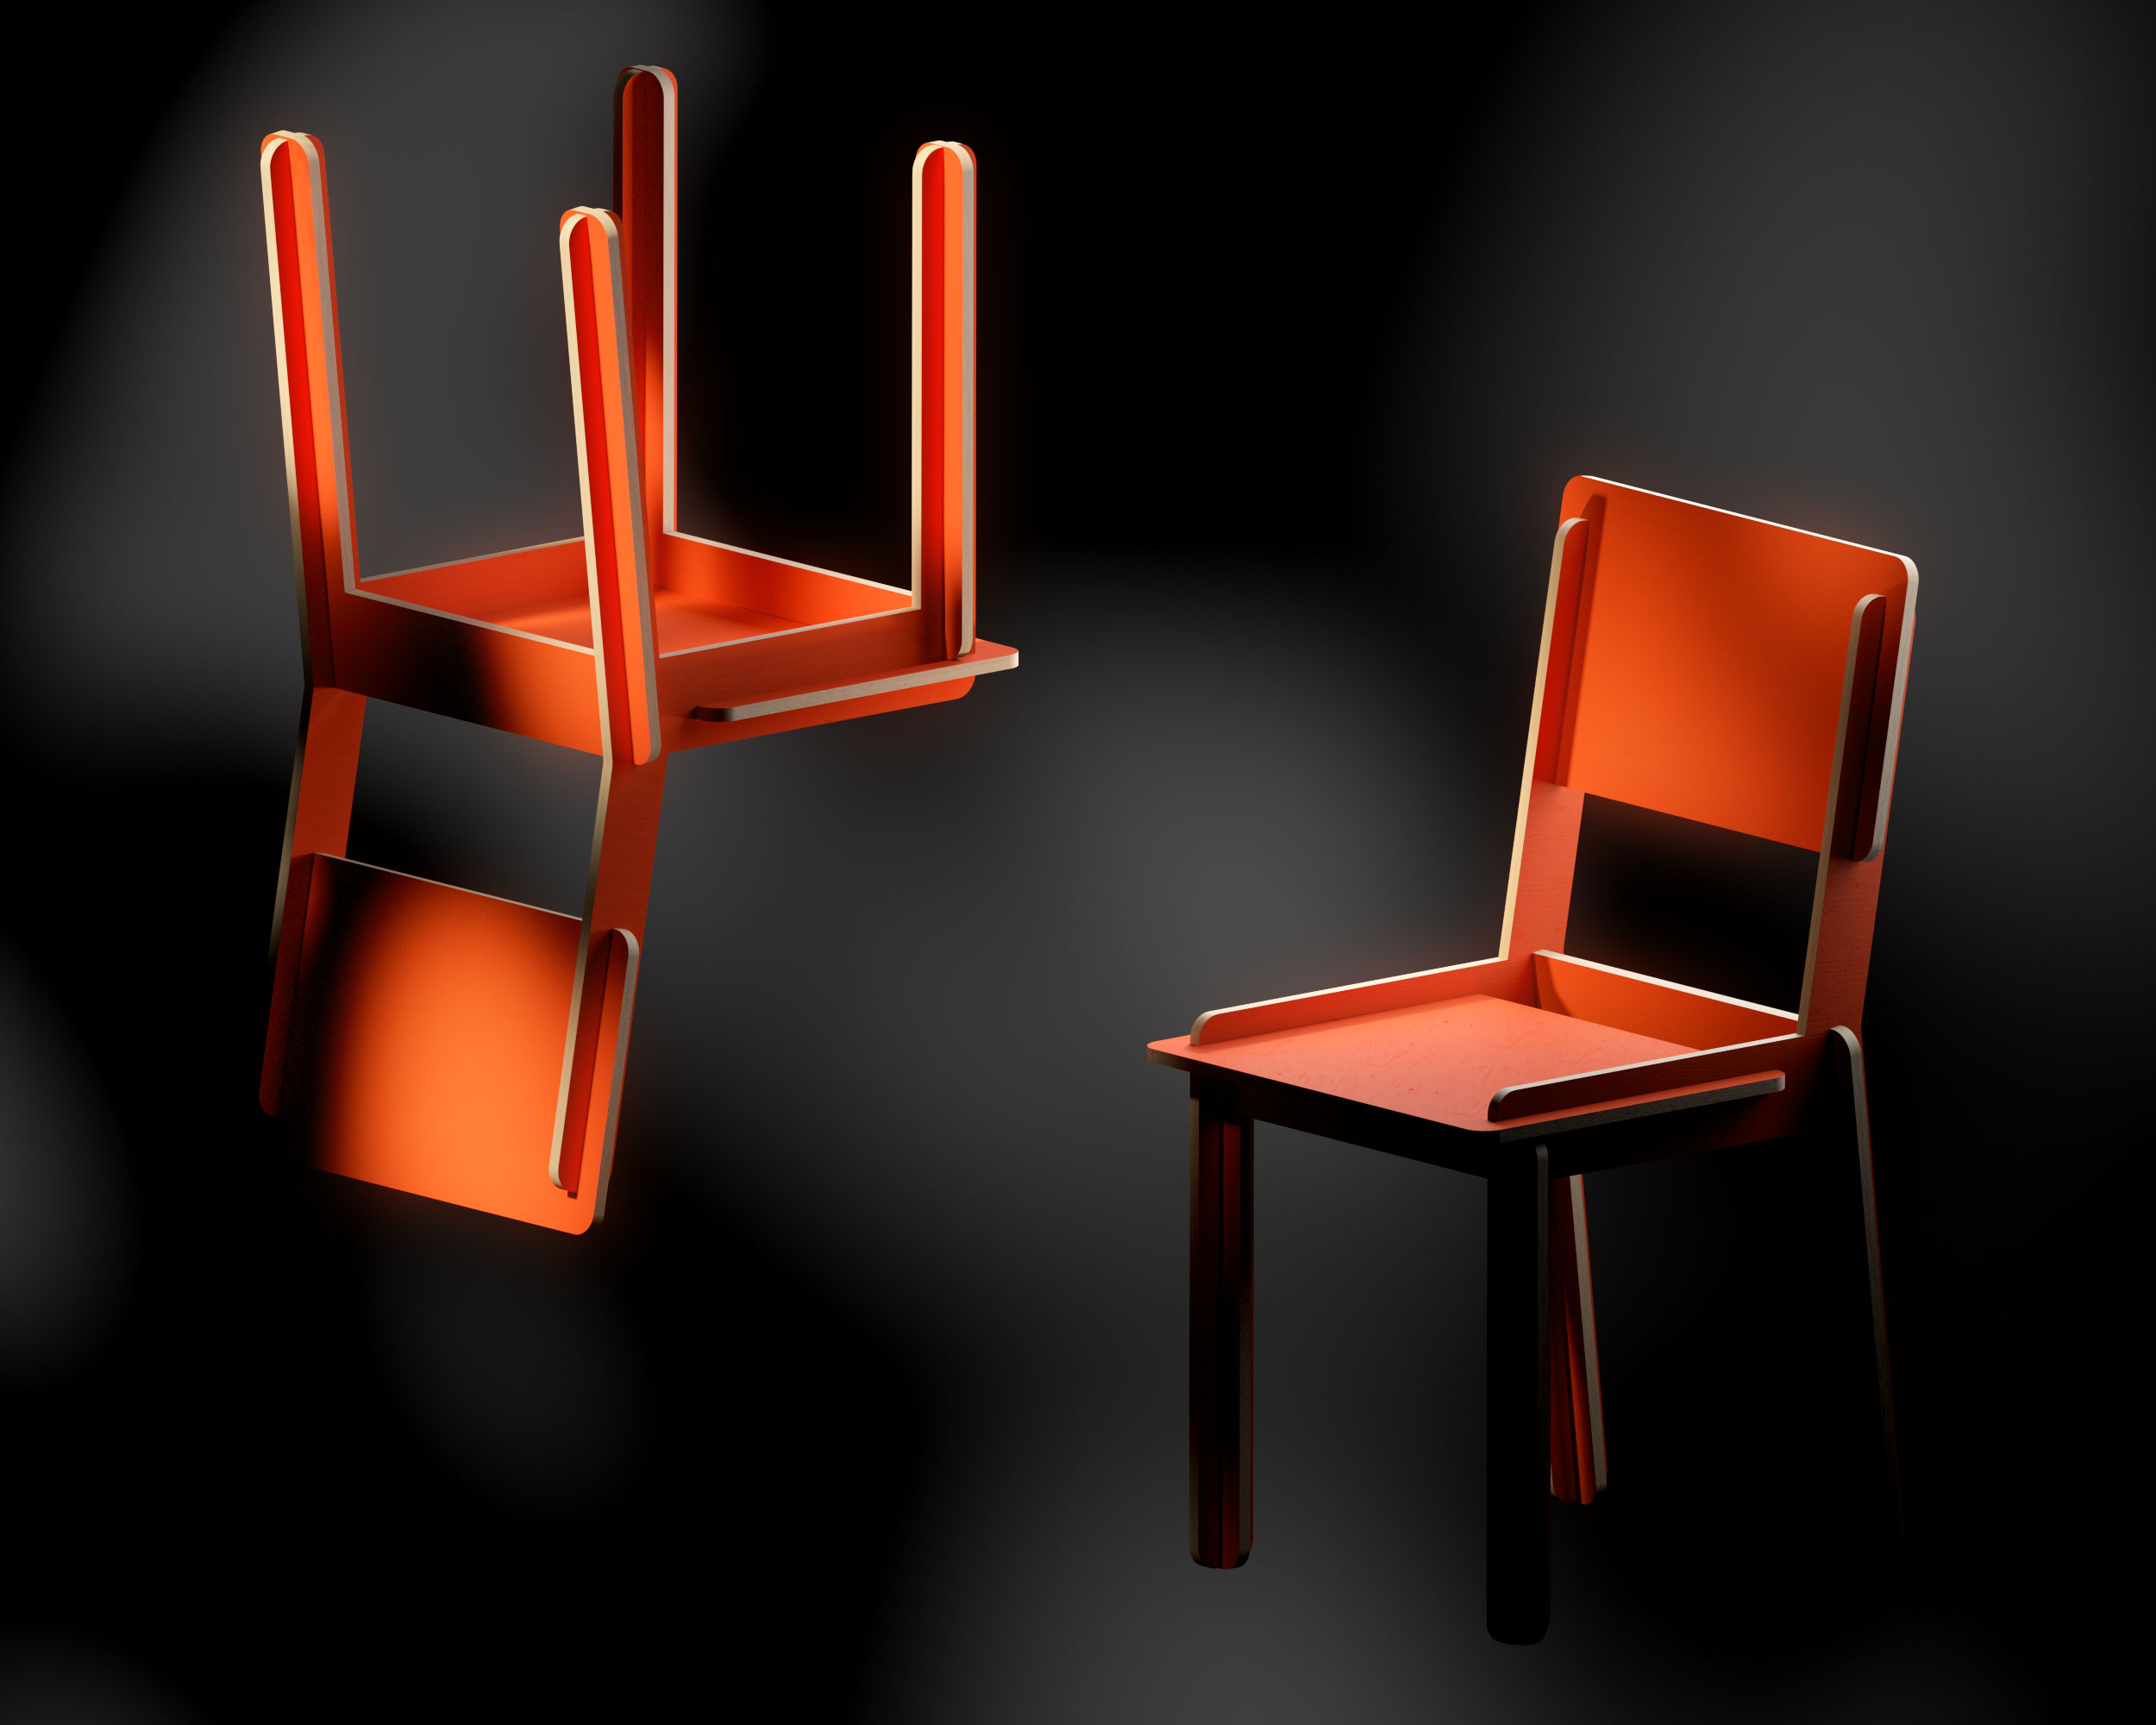 JOSLBOM_chair_product